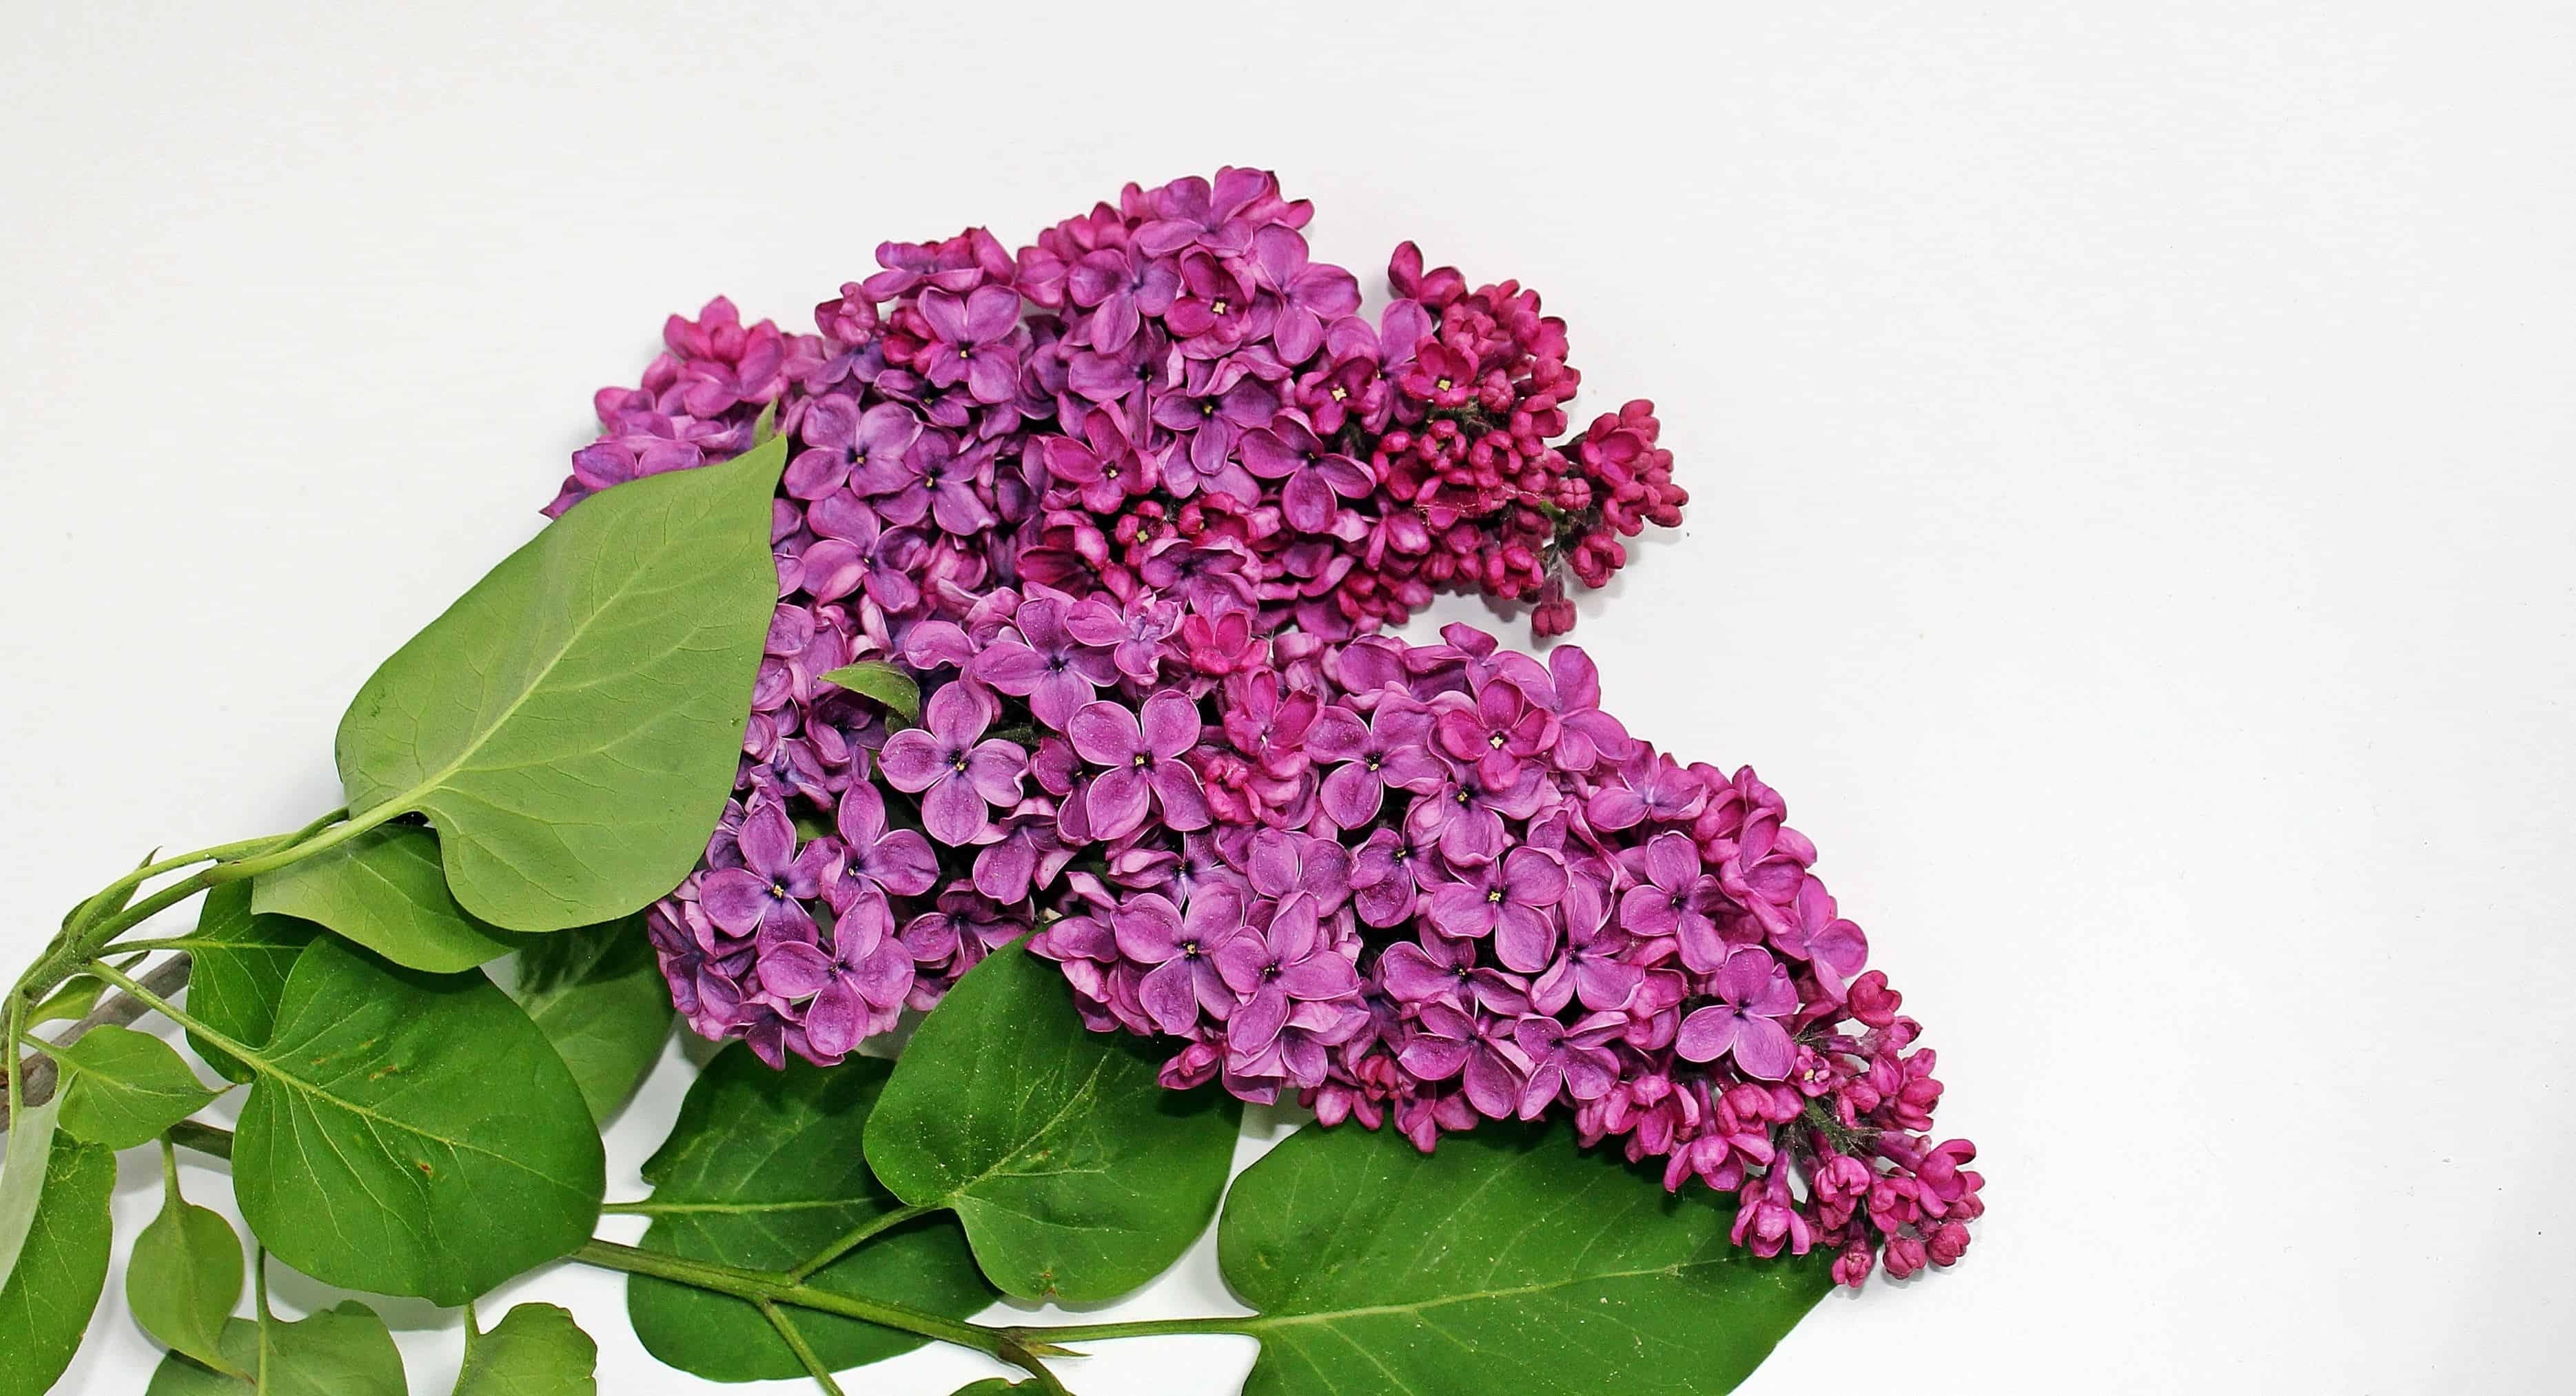 Imagen gratis: lila, flor, horticultura, hoja, naturaleza, planta ...